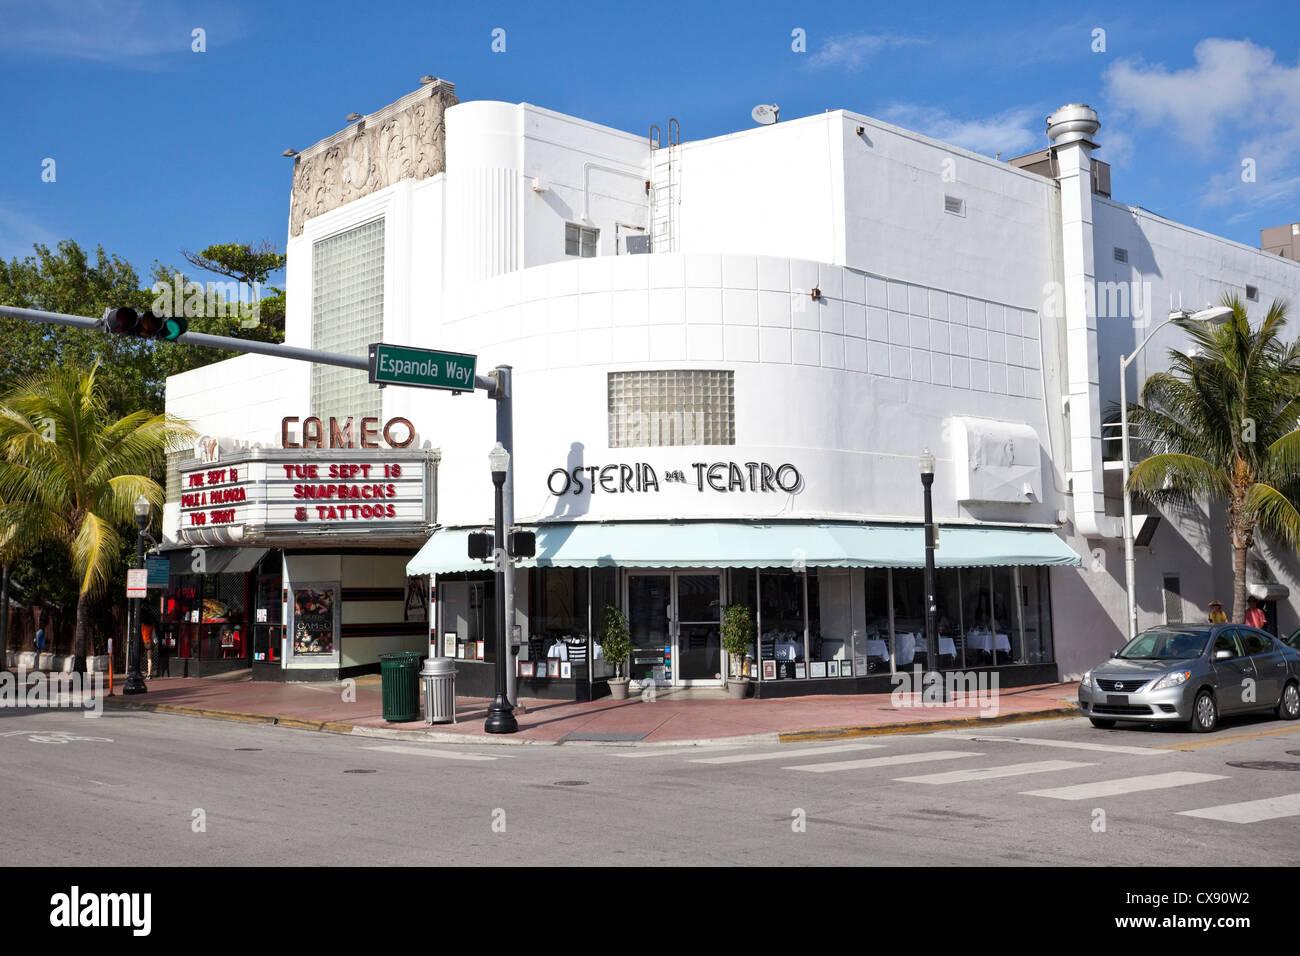 The Cameo Theater on corner of Washington Avenue and Espanola Way, Art Deco District, Miami Beach, Florida, USA - Stock Image